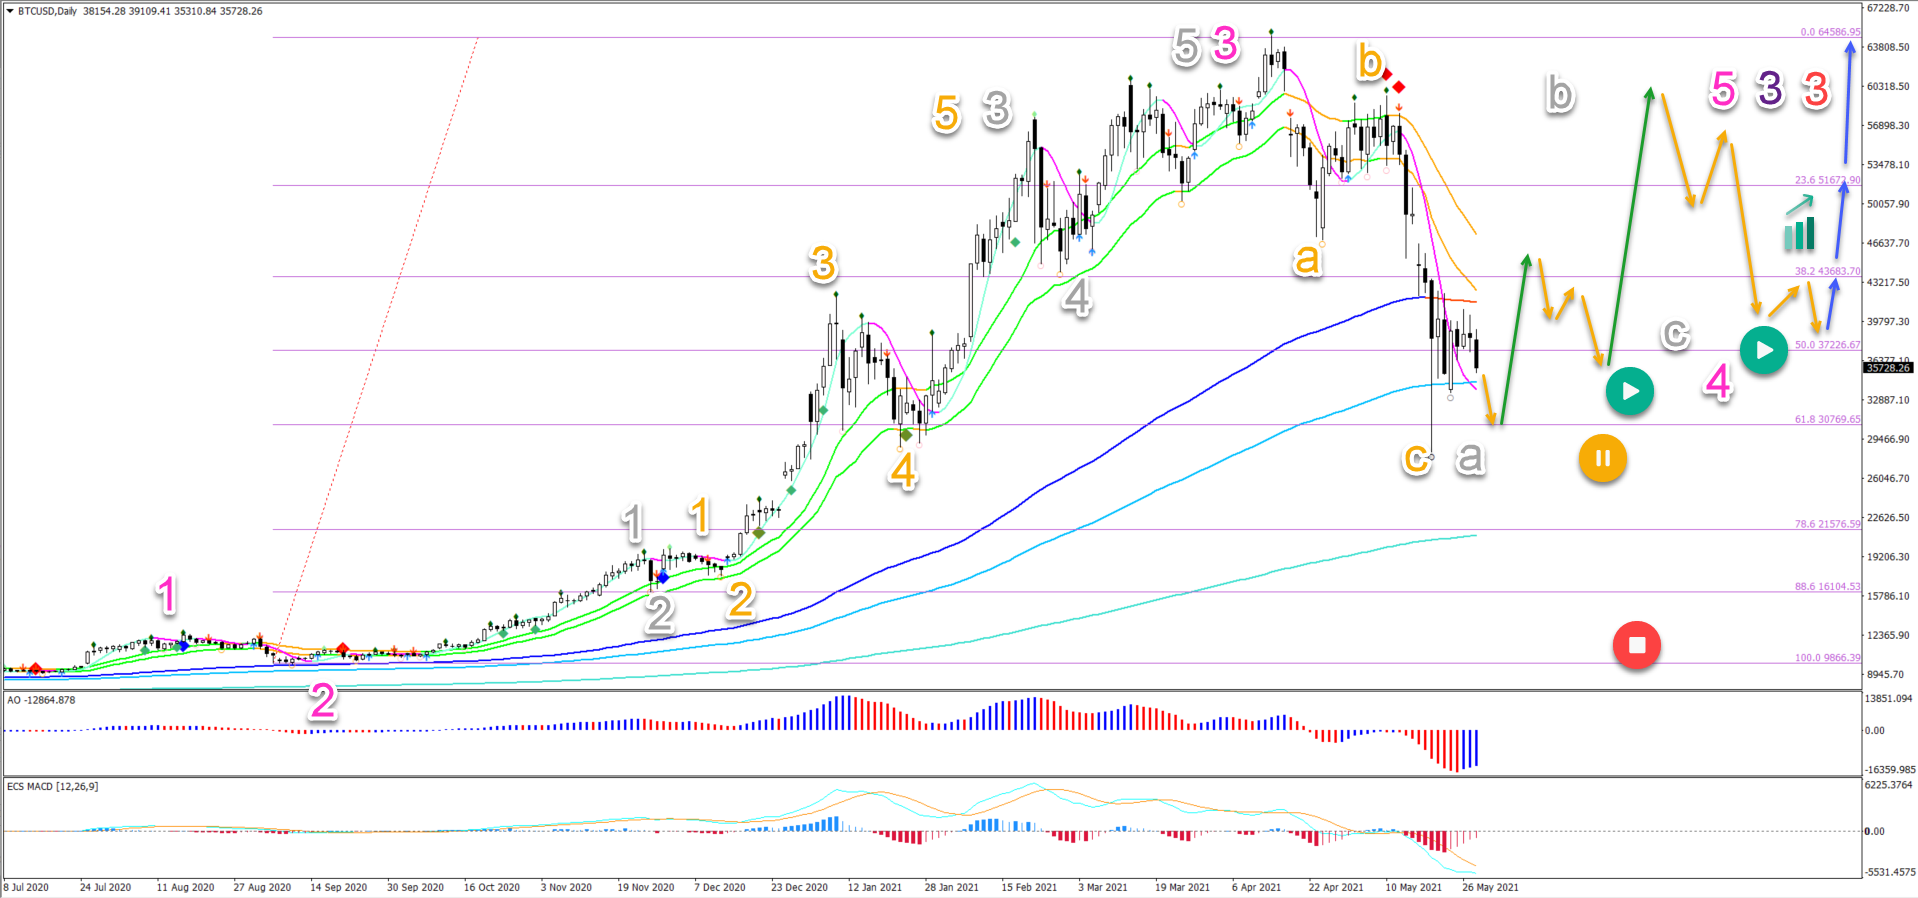 BTC/USD 28.5.2021 daily chart